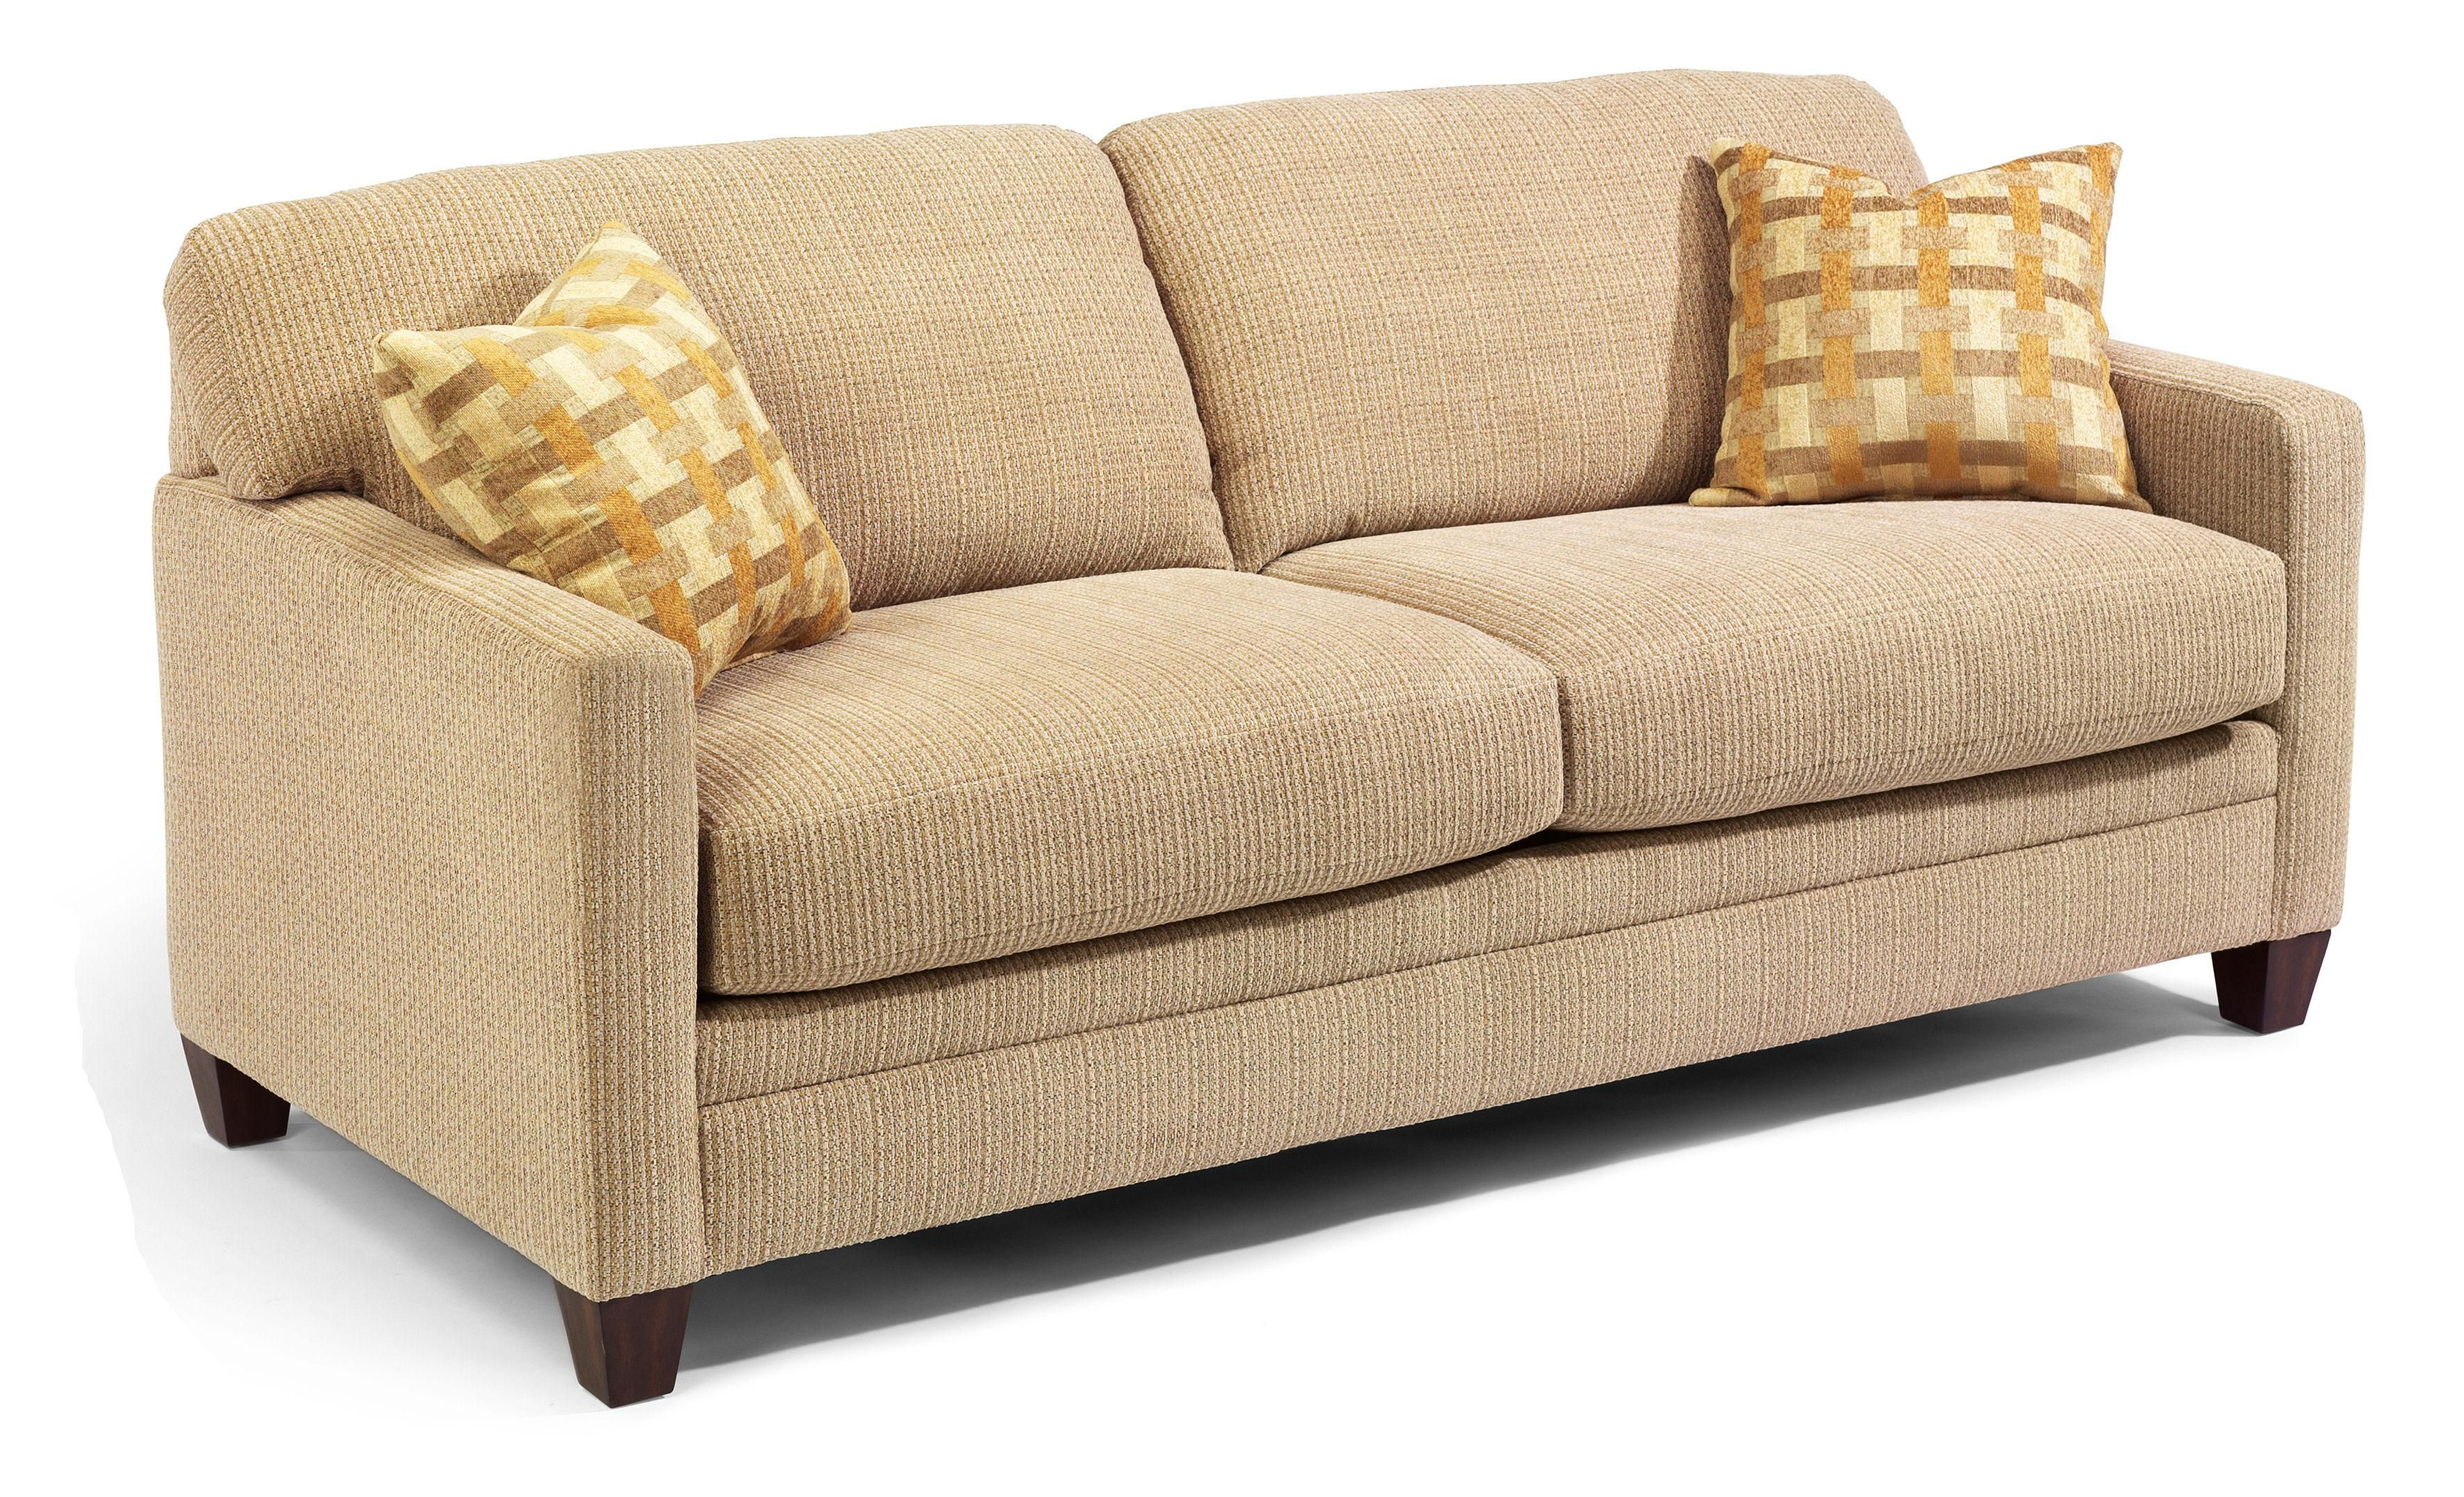 Serendipity Upholstered Sofa Sleeper by Flexsteel Sofa